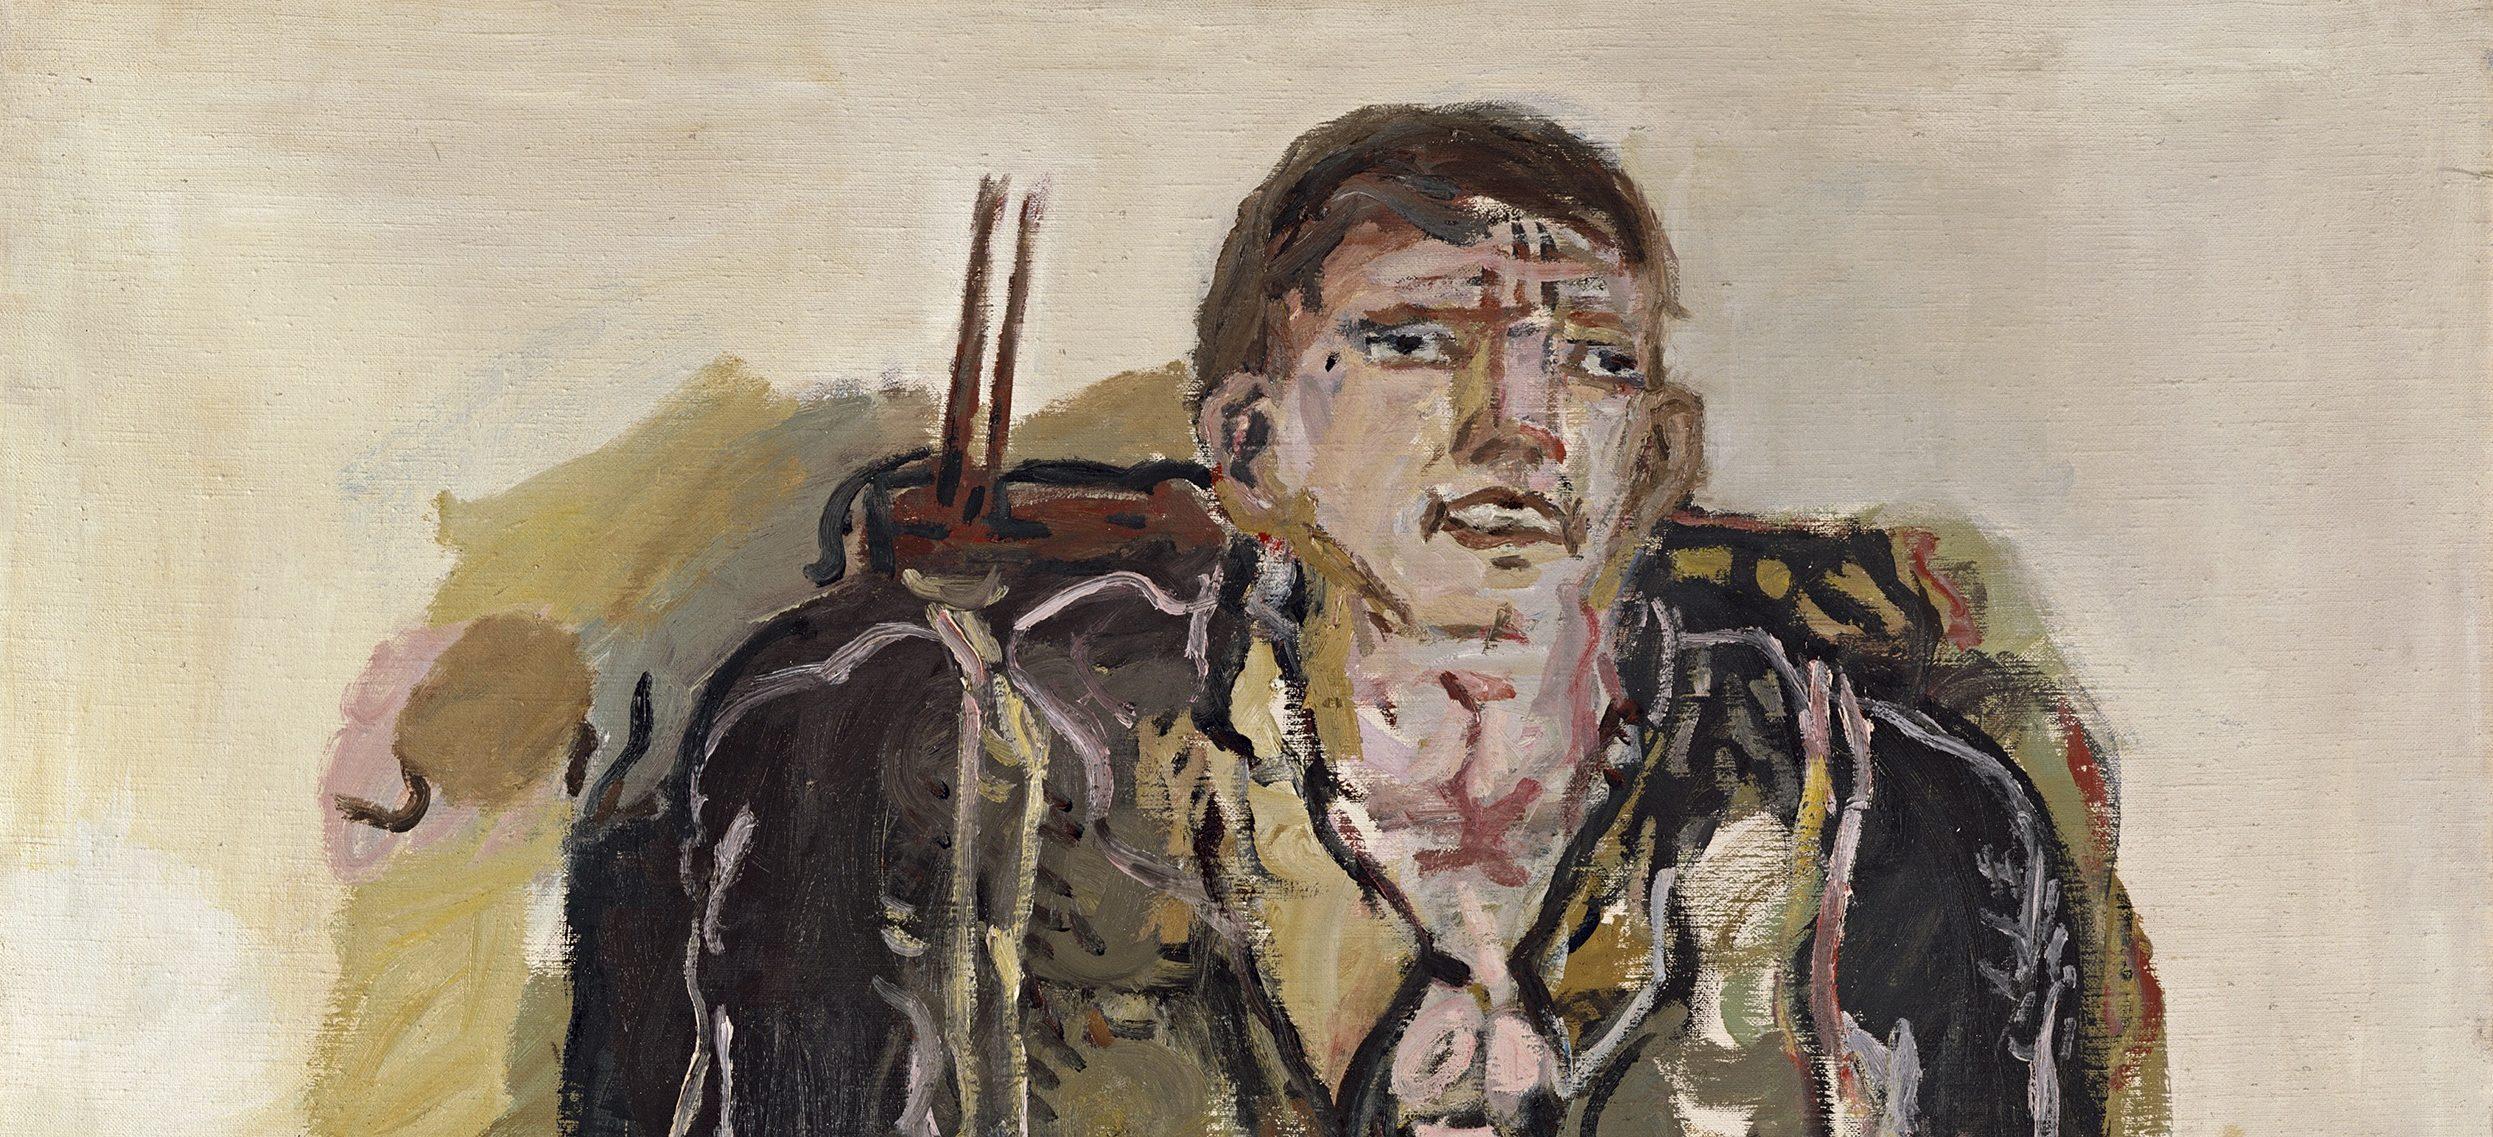 Georg Baselitz El pintor moderno (Der moderne Maler), 1965 Óleo sobre lienzo 162 x 130 cm Colección particular © Georg Baselitz, 2017 Foto: Frank Oleski, Colonia